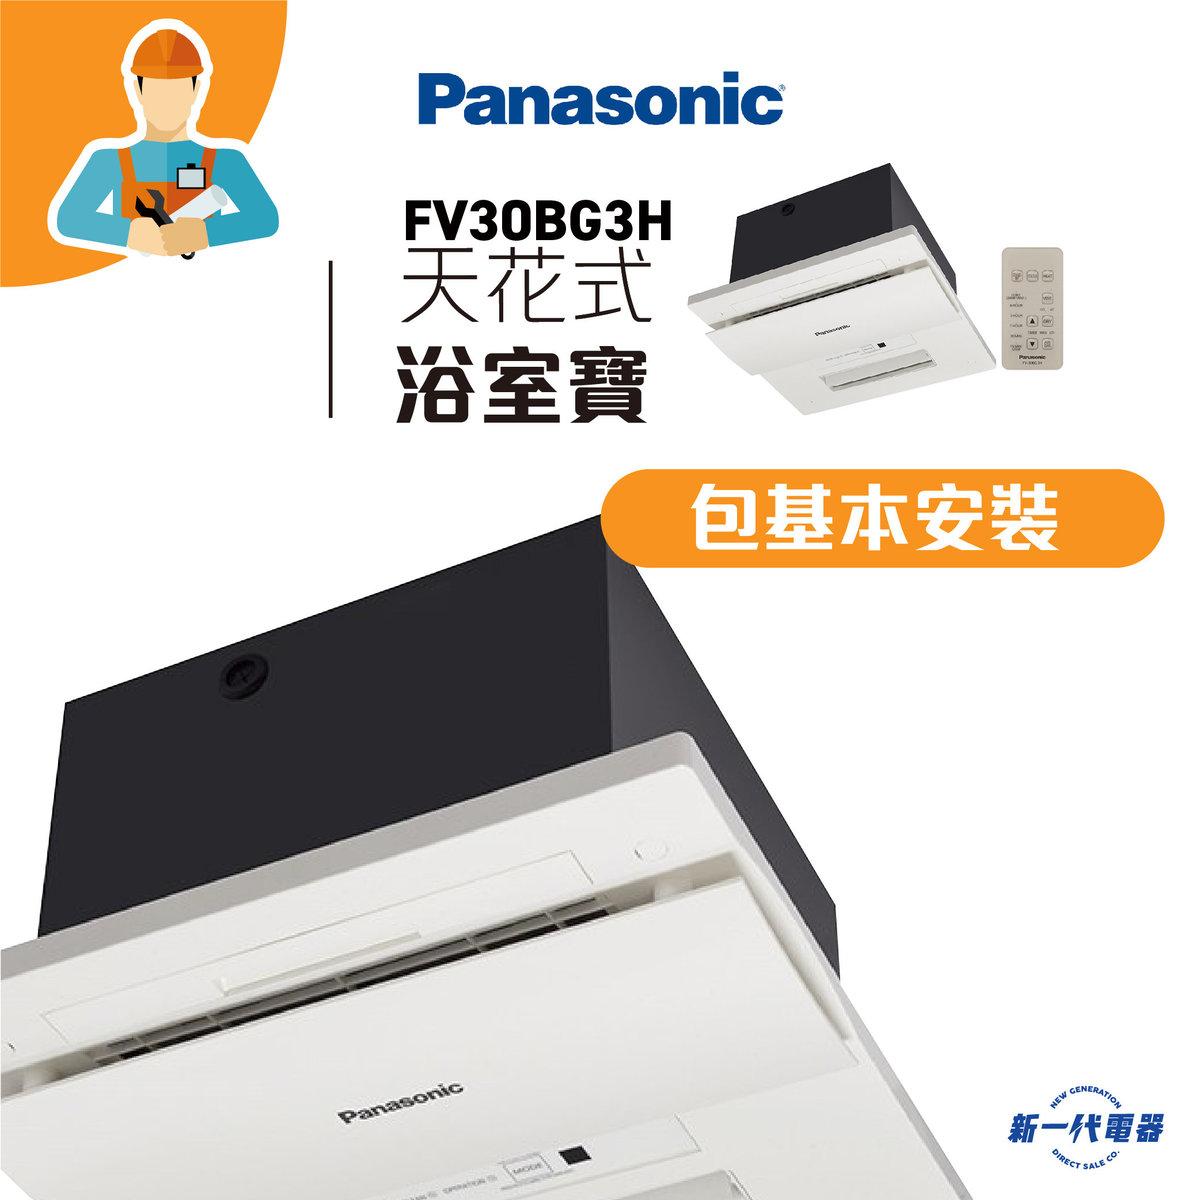 FV-30BG3H  (Basic installation) Ceiling Mount Thermo Ventilator (Slim)